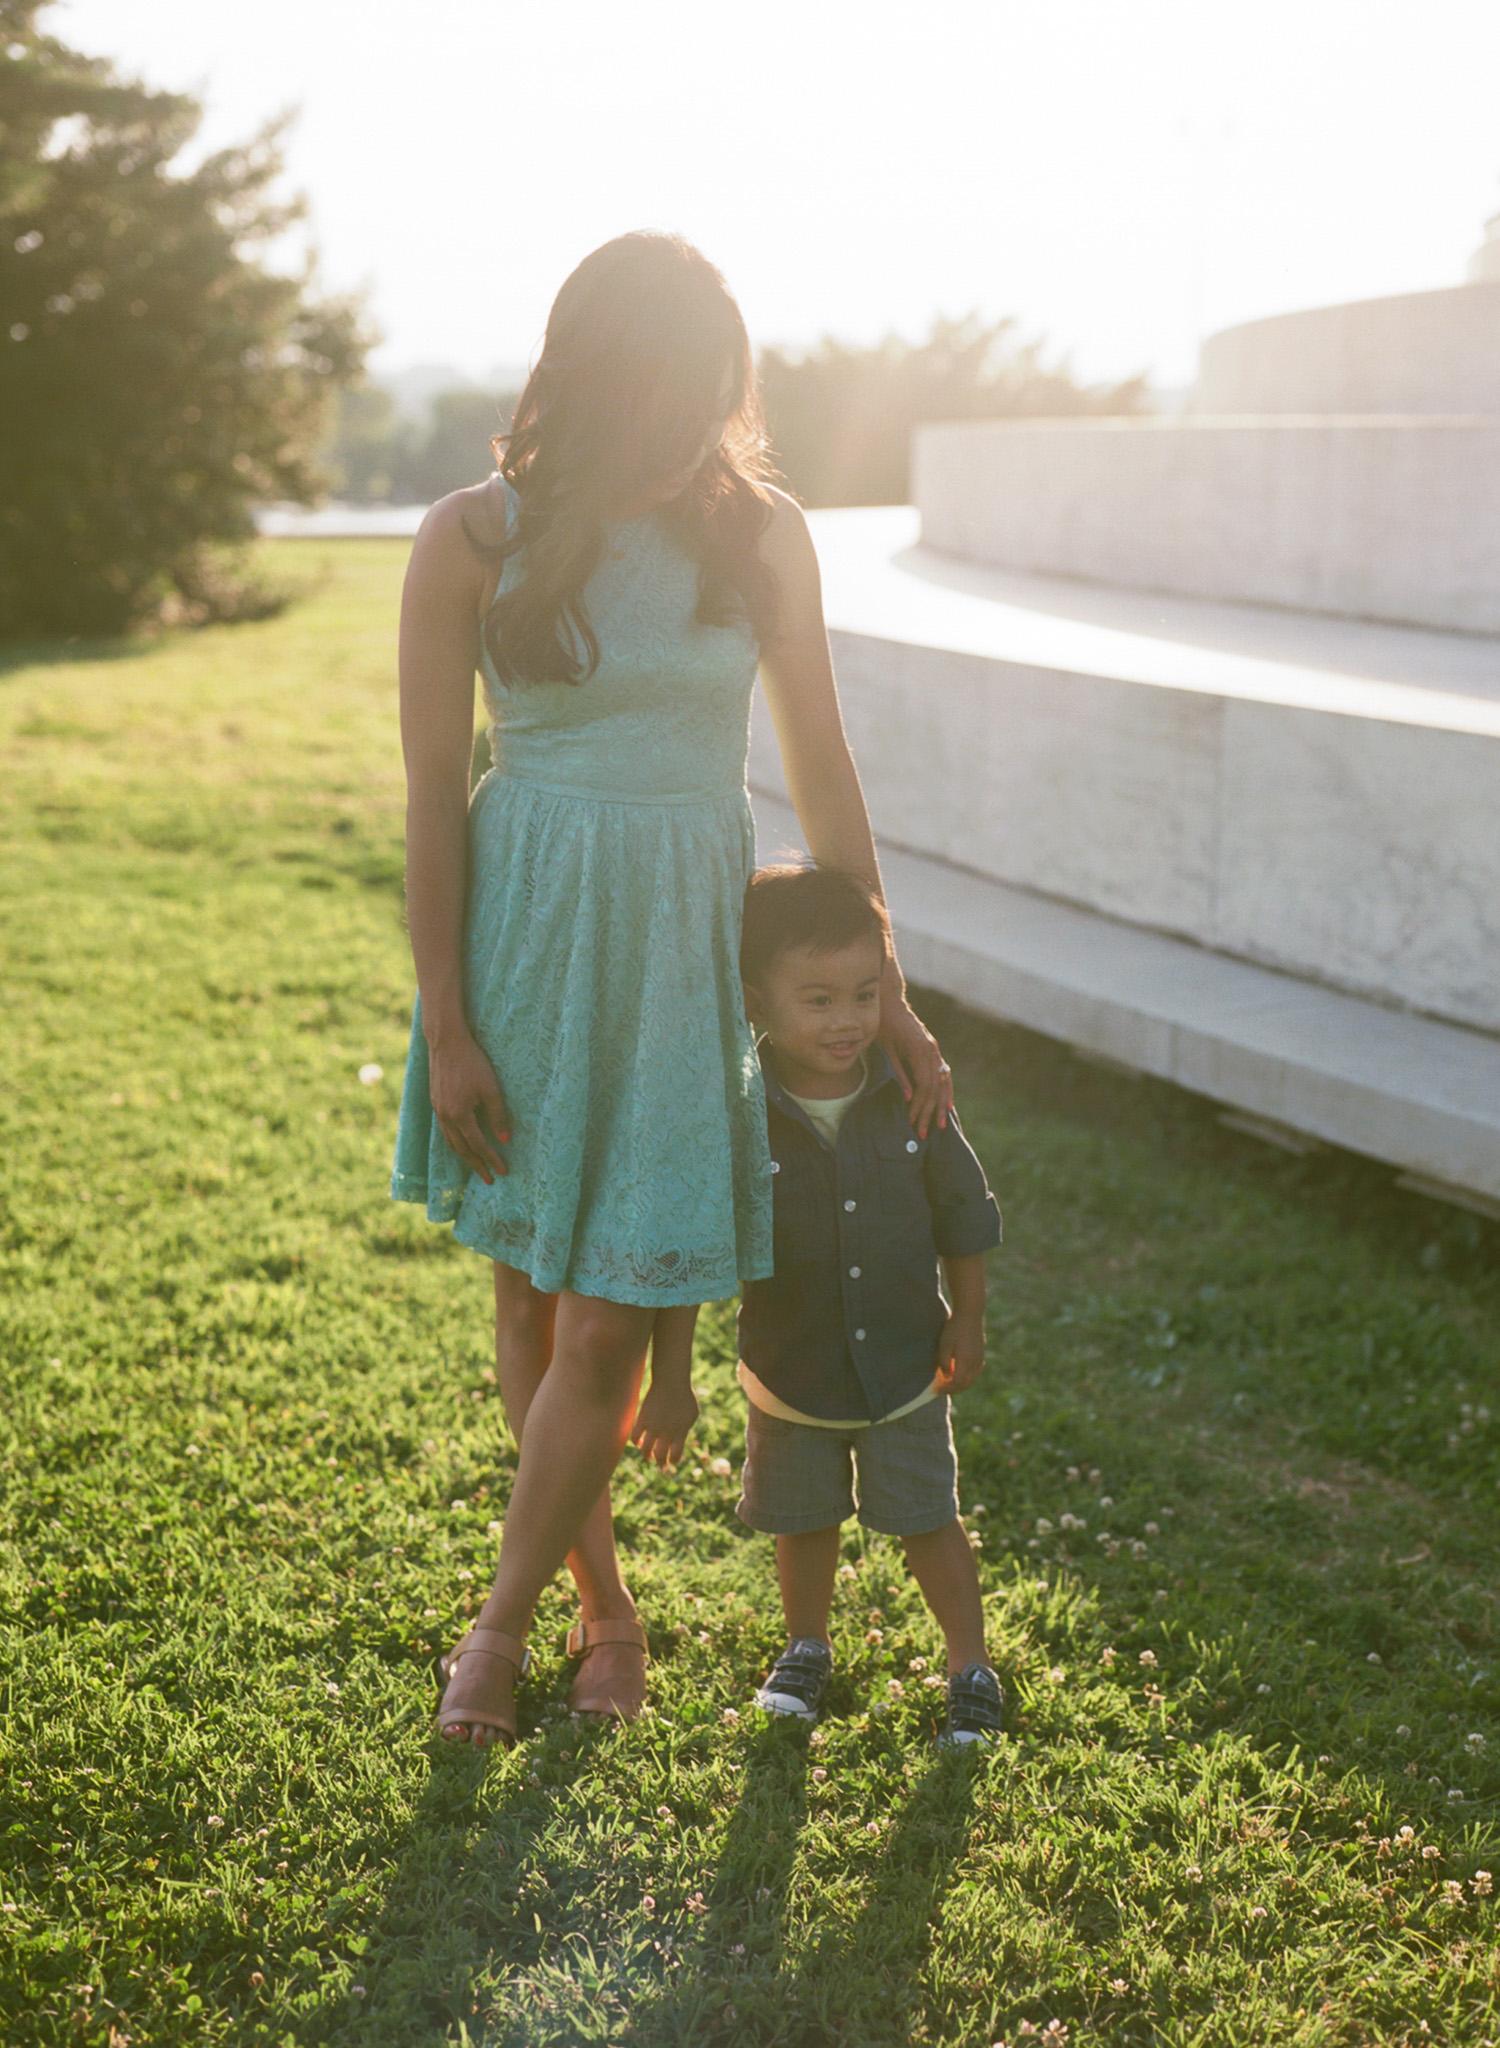 Jefferson-Memorial-Portrait-Photographer-17.jpg